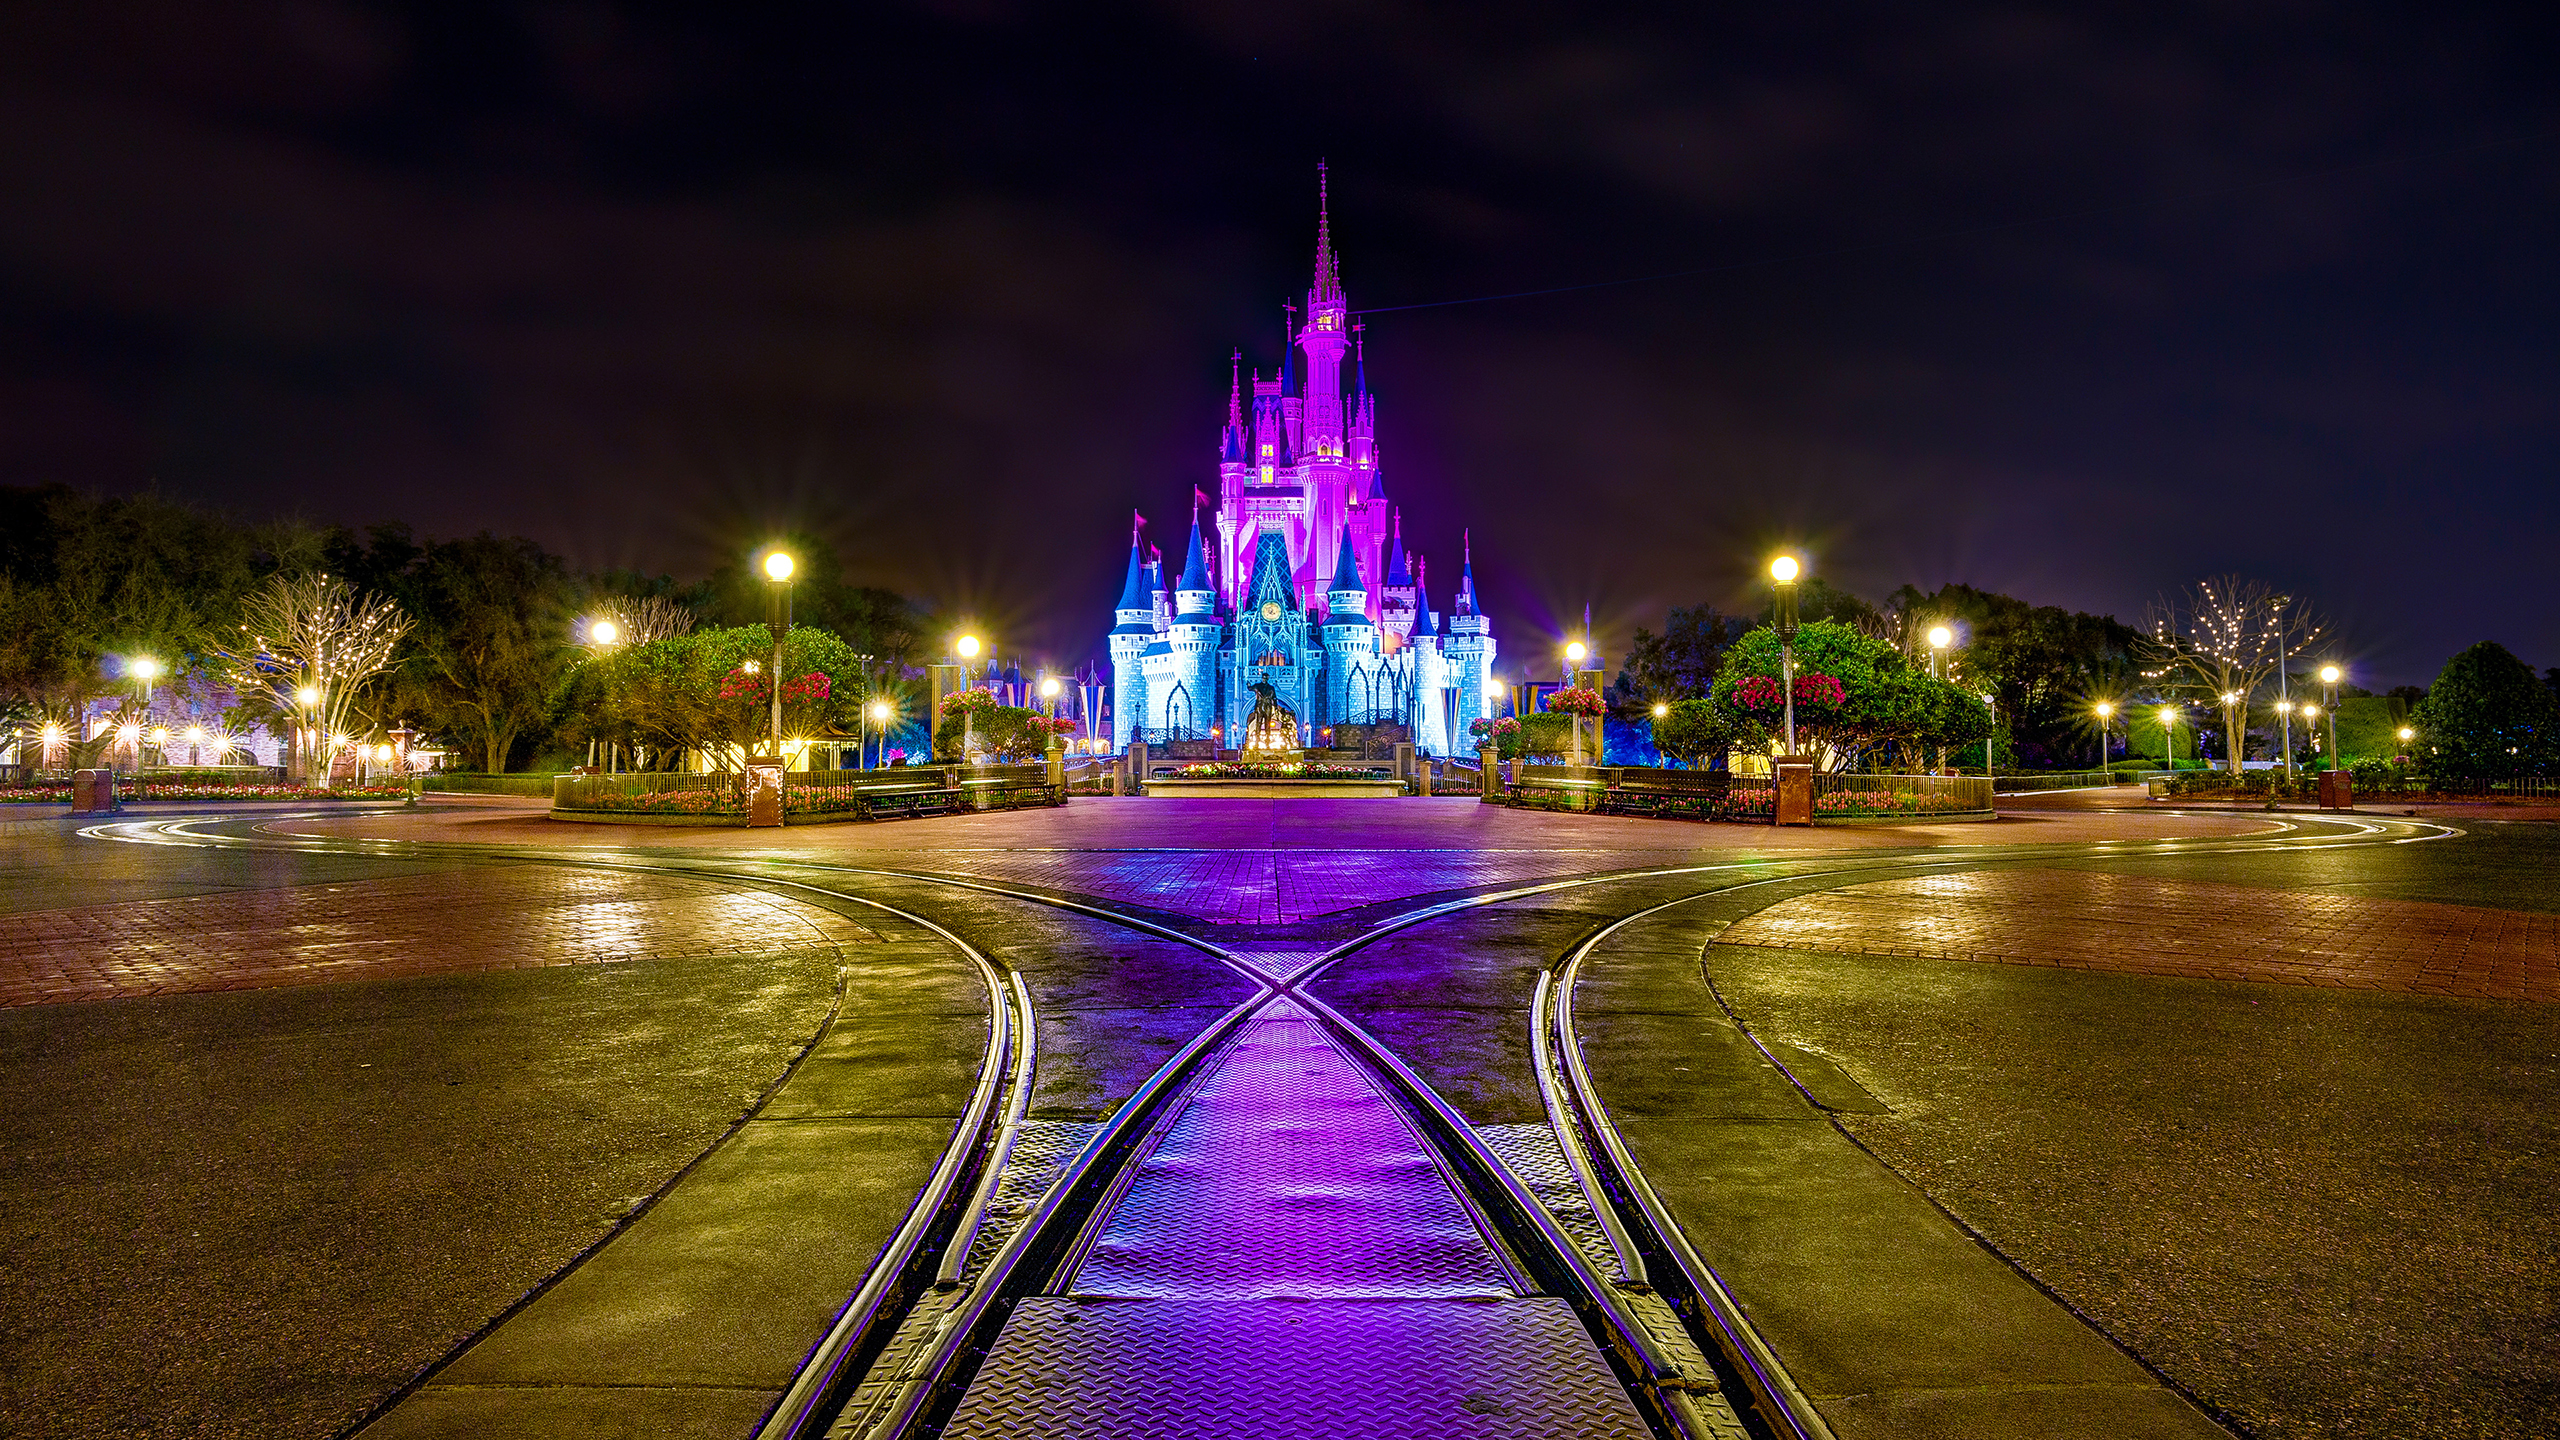 Disneyland Tumblr Wallpaper Full Hd Disney World Cinderella Castle 880100 Hd Wallpaper Backgrounds Download